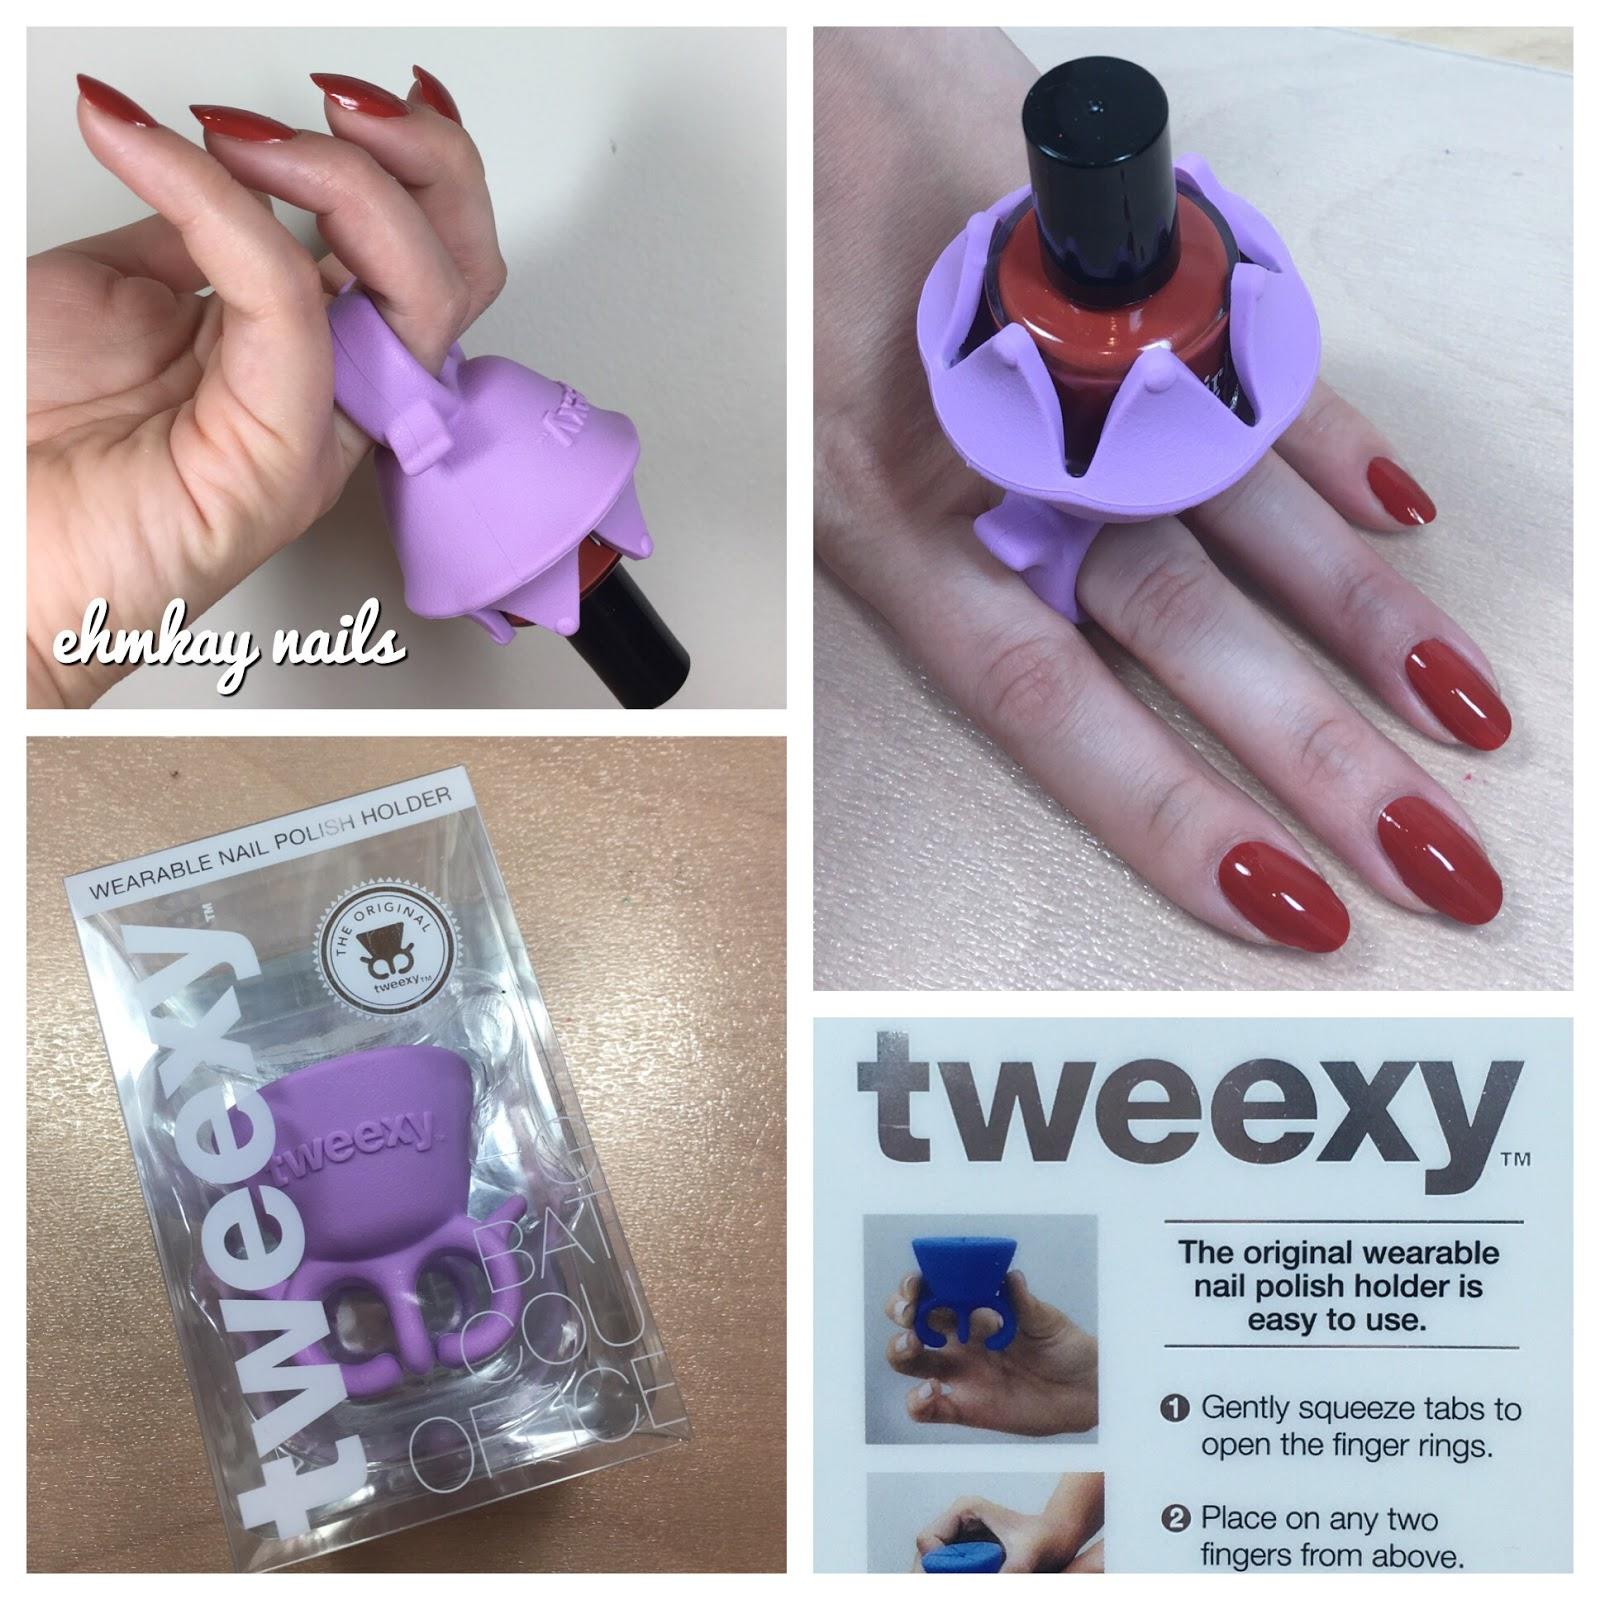 Tweexy Wearable Nail Polish Holder Review